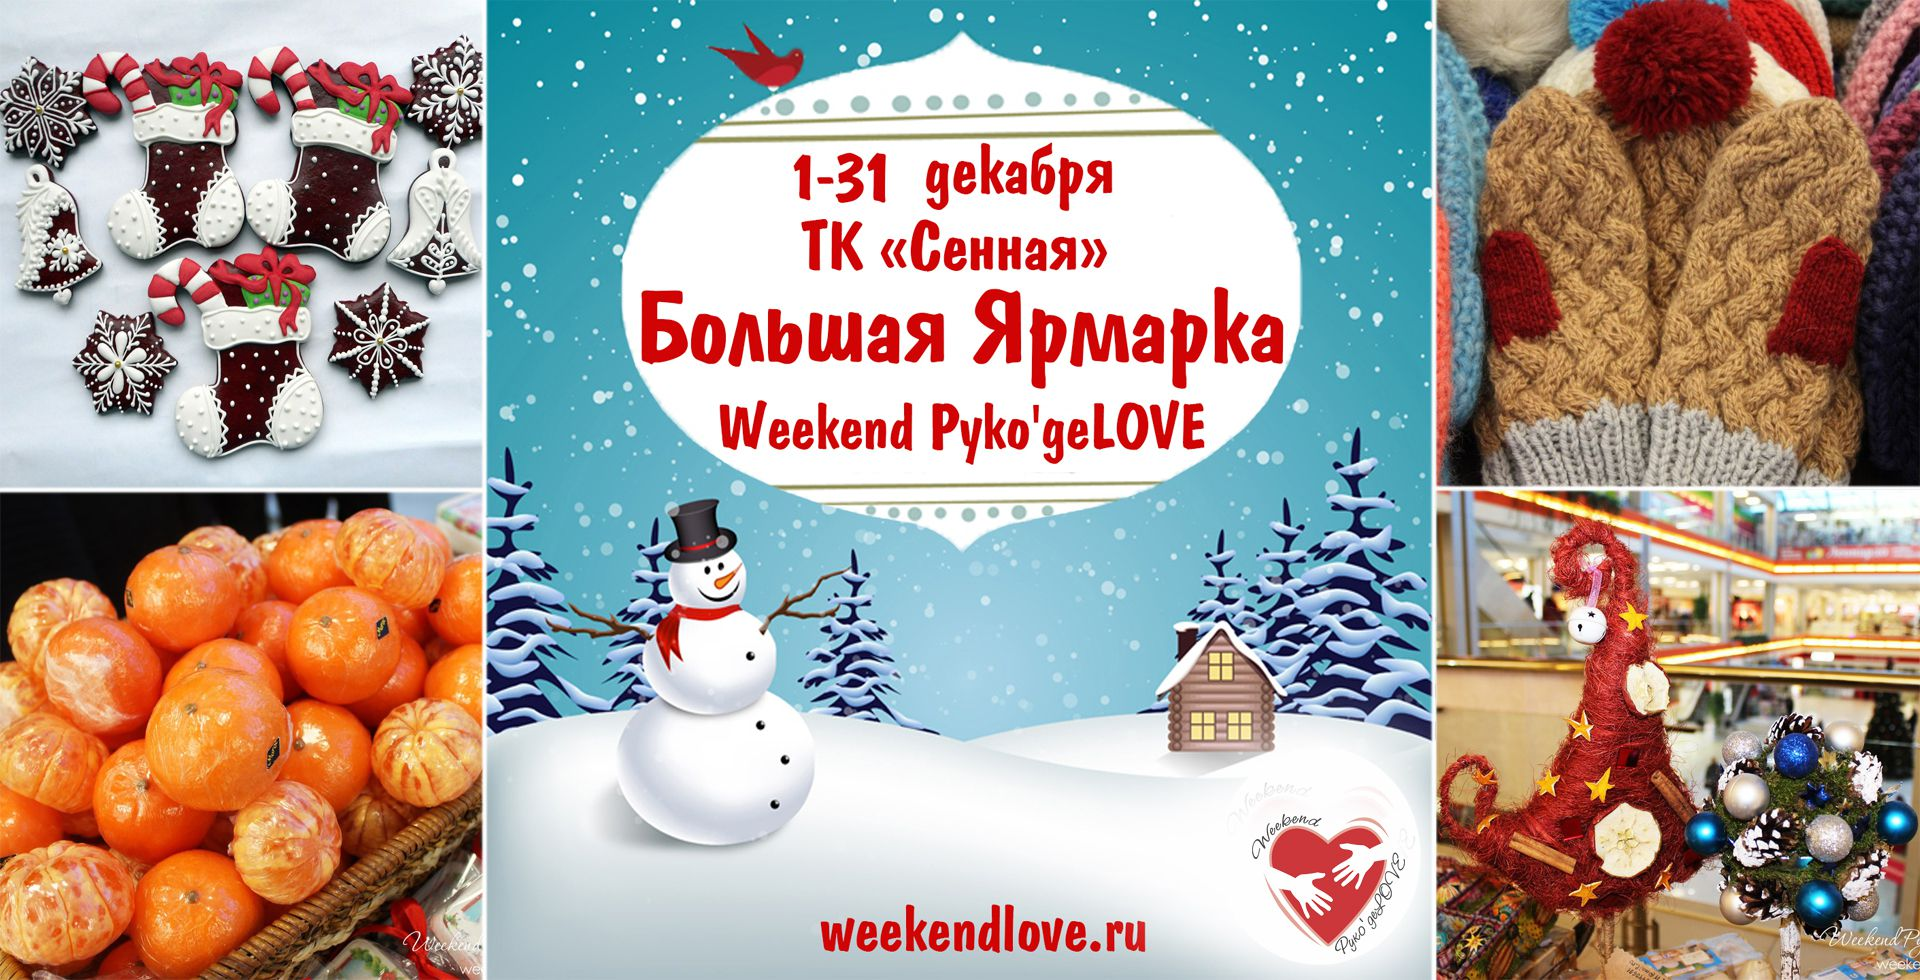 новогодняя_ярмарка выставка ручная_работа weekend_руко'деlove спб handmade галерея_мастеров ярмарка